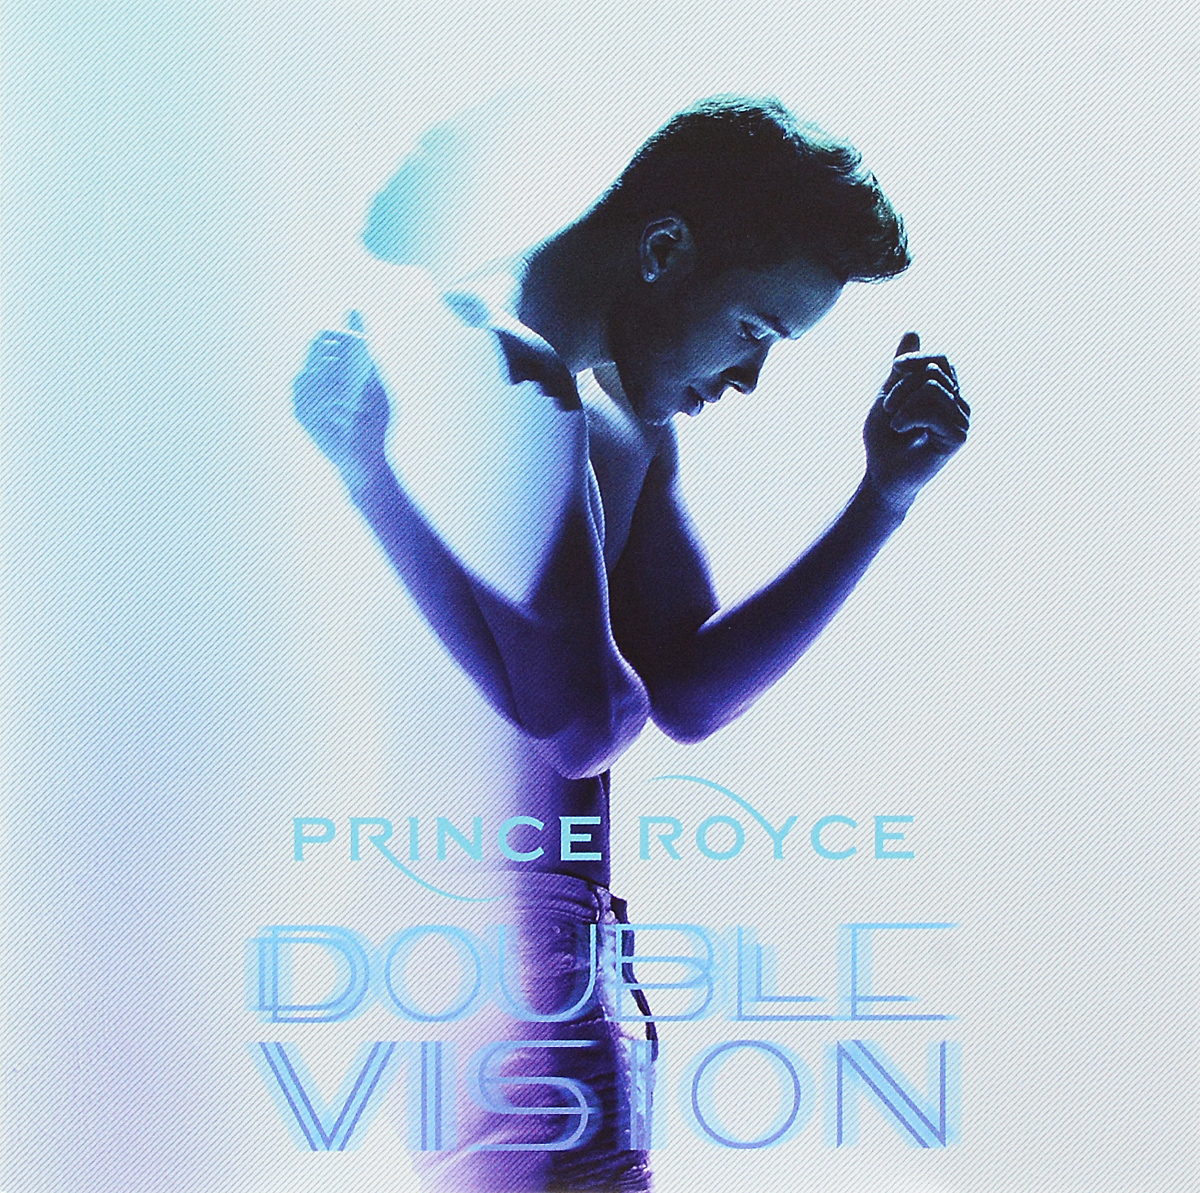 Prince Royce Prince Royce. Double Vision prince royce prince royce double vision deluxe edition